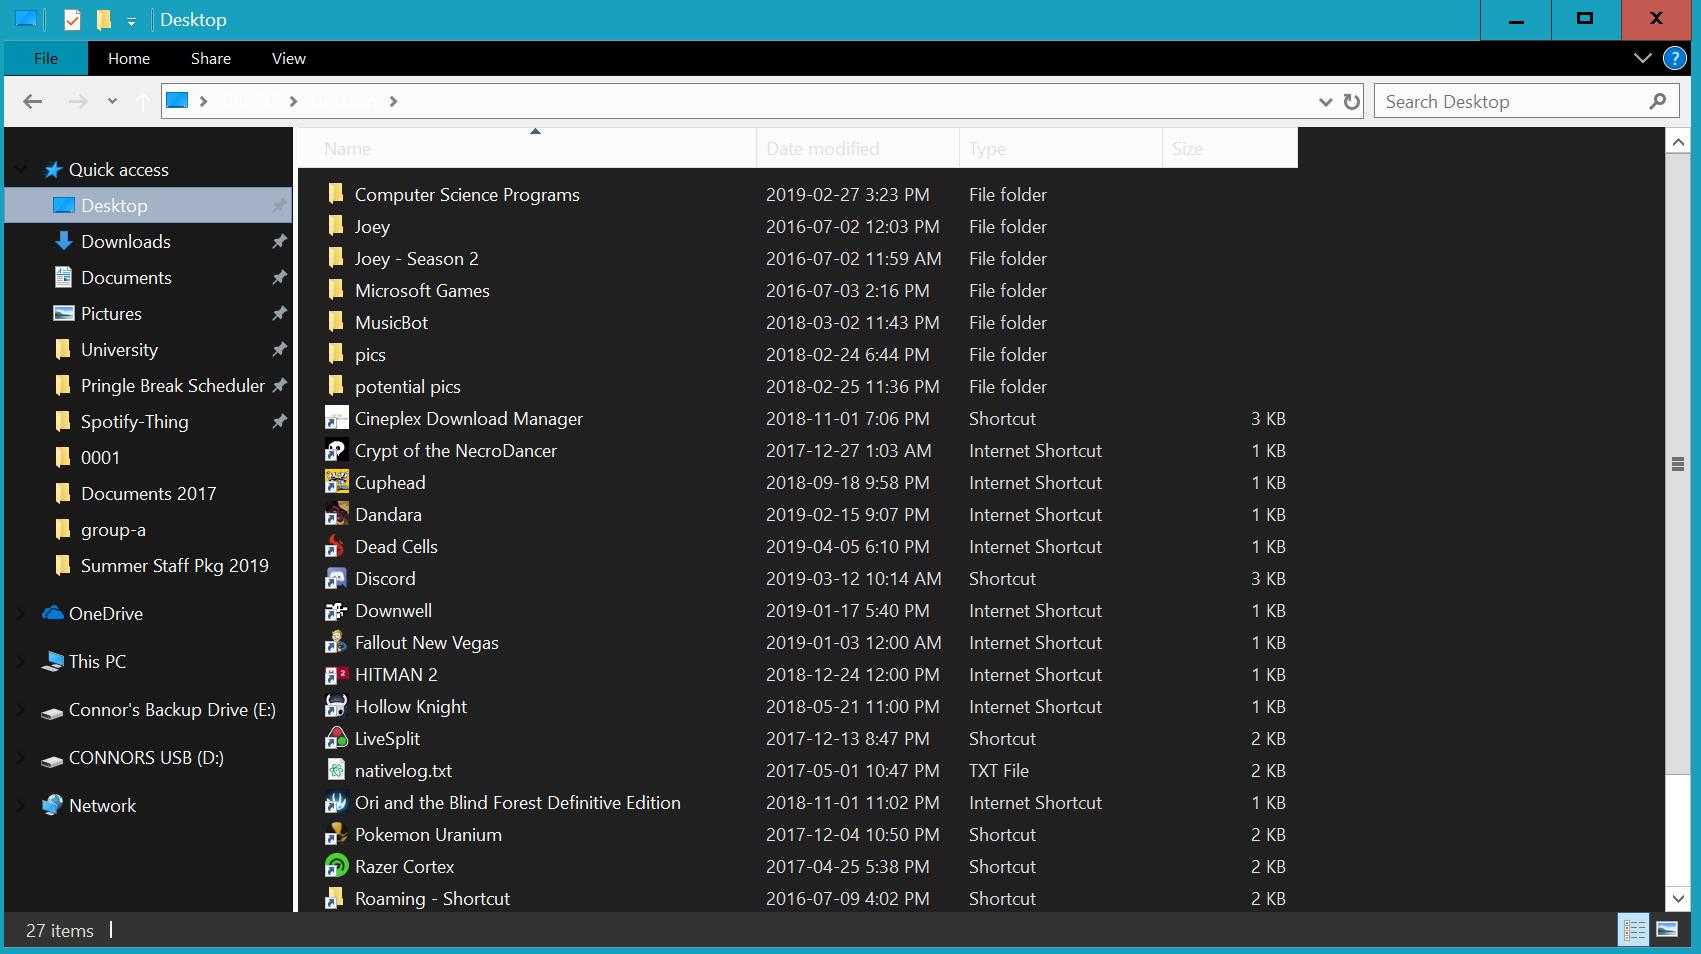 File Explorer - Dark theme looks weird 2c40f384-e86c-4b64-b9ff-65ba88b8c4b7?upload=true.png